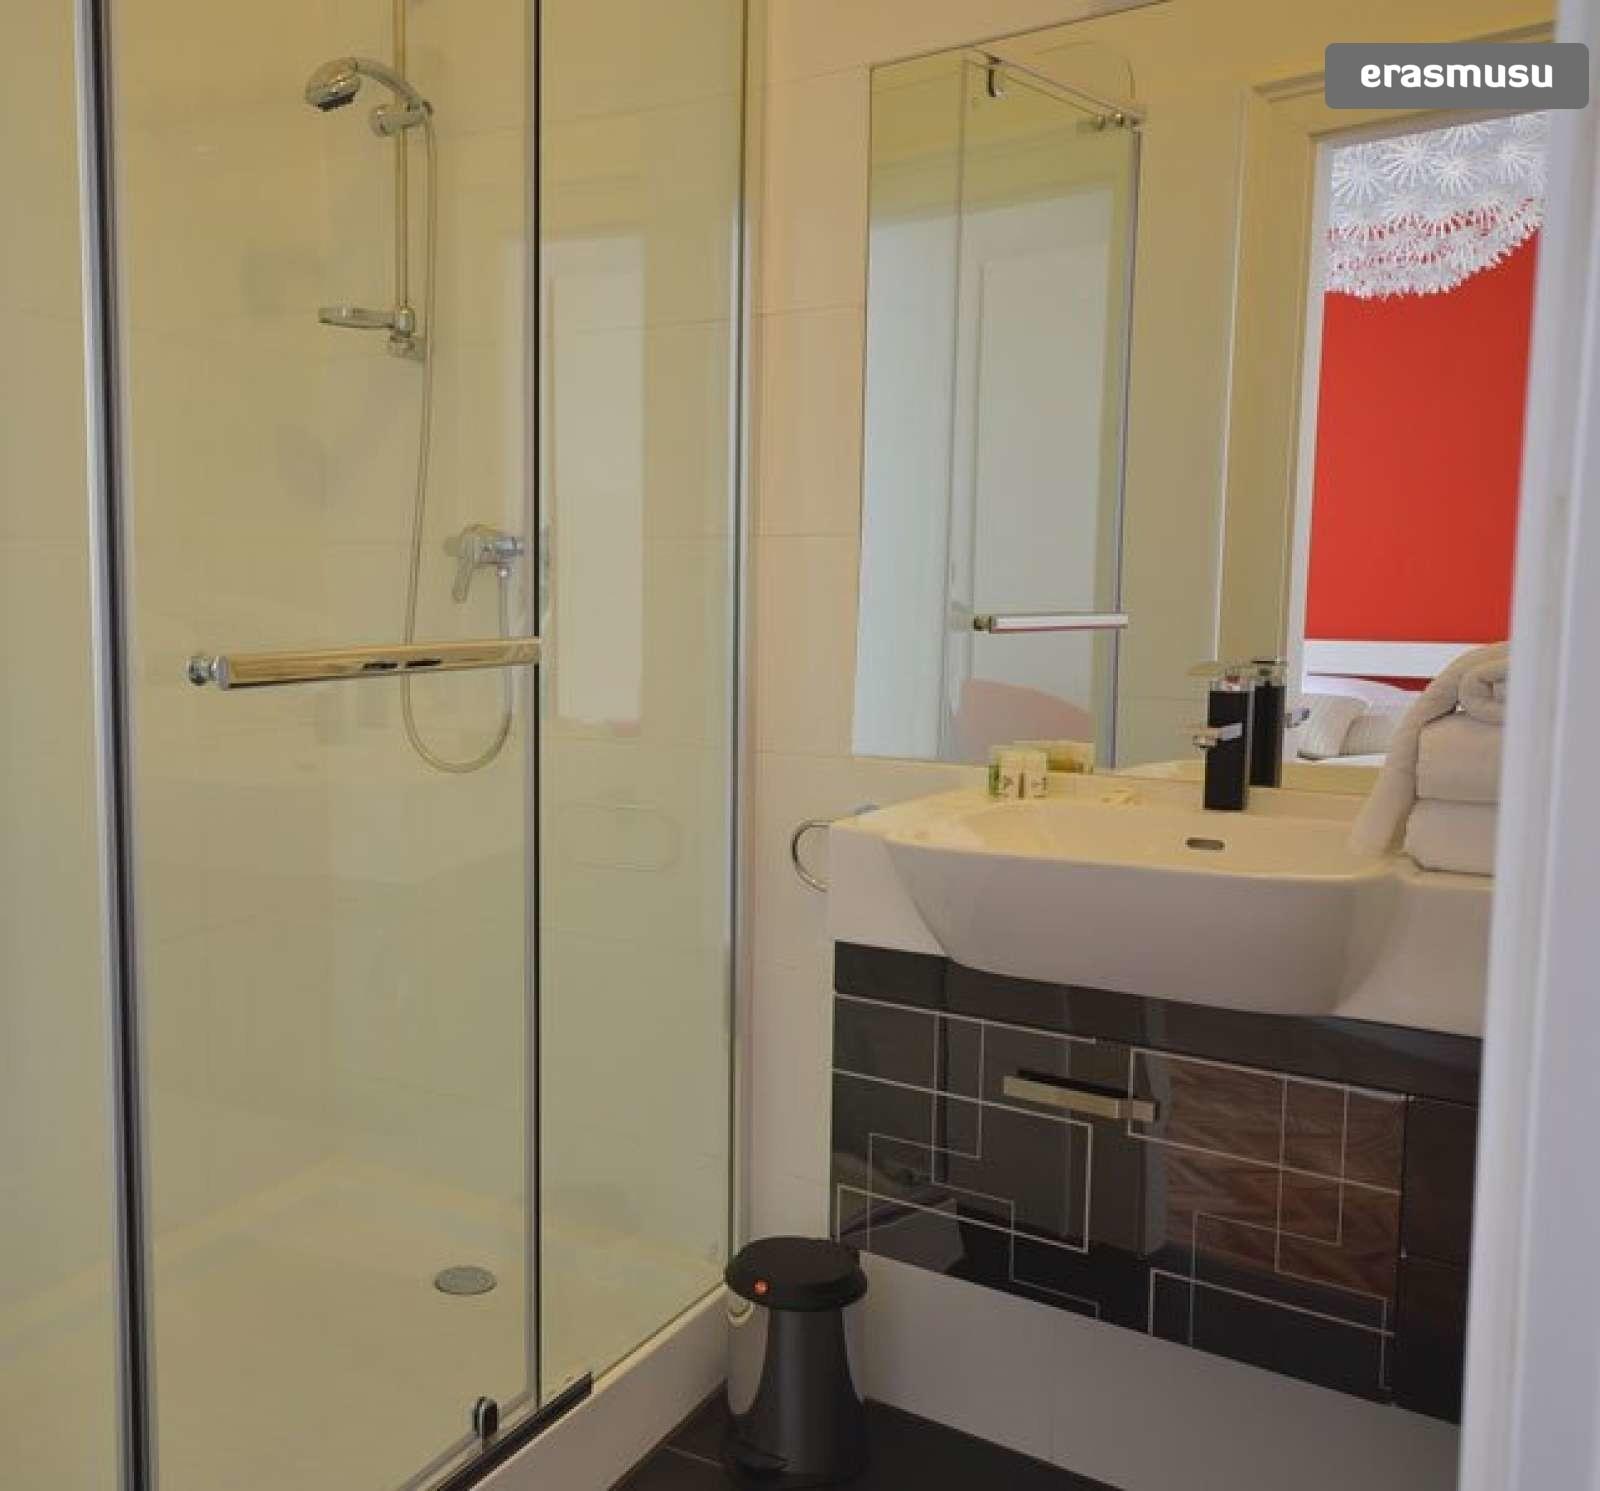 bright-studio-apartment-rent-near-ober-st-veit-u-bahn-station-46